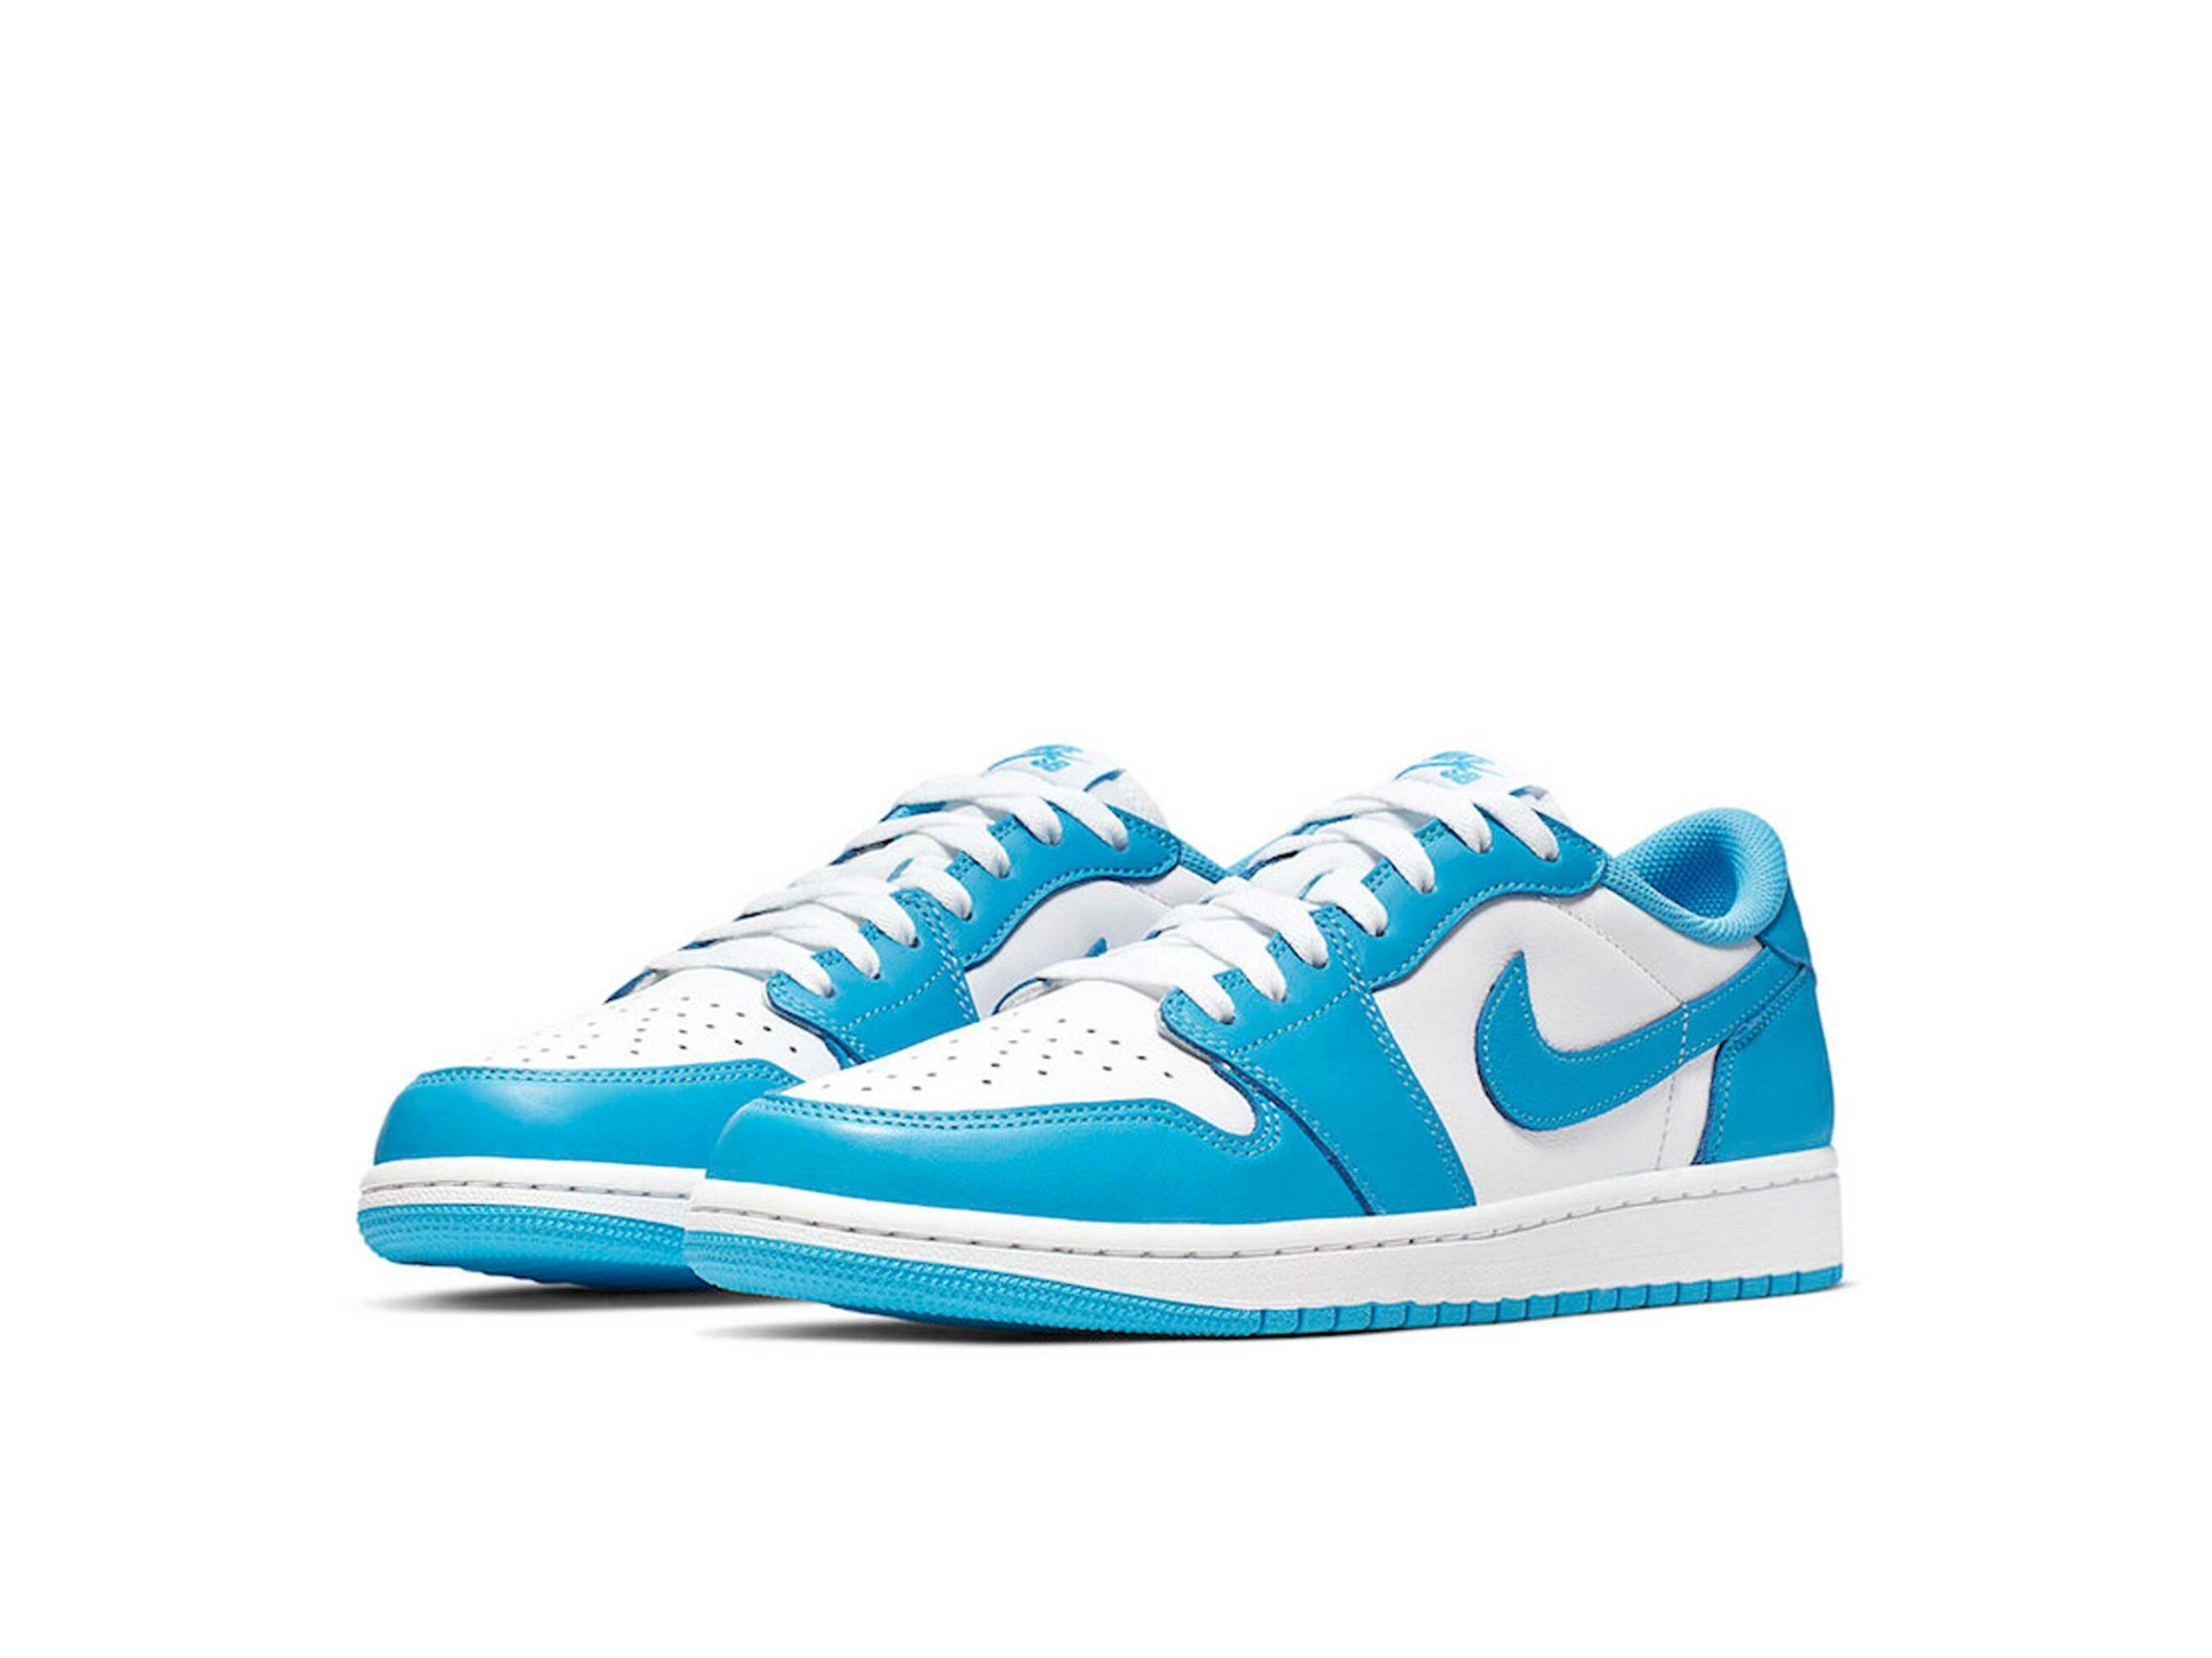 nike sb air Jordan 1 low unc blue white cj7891_401 купить